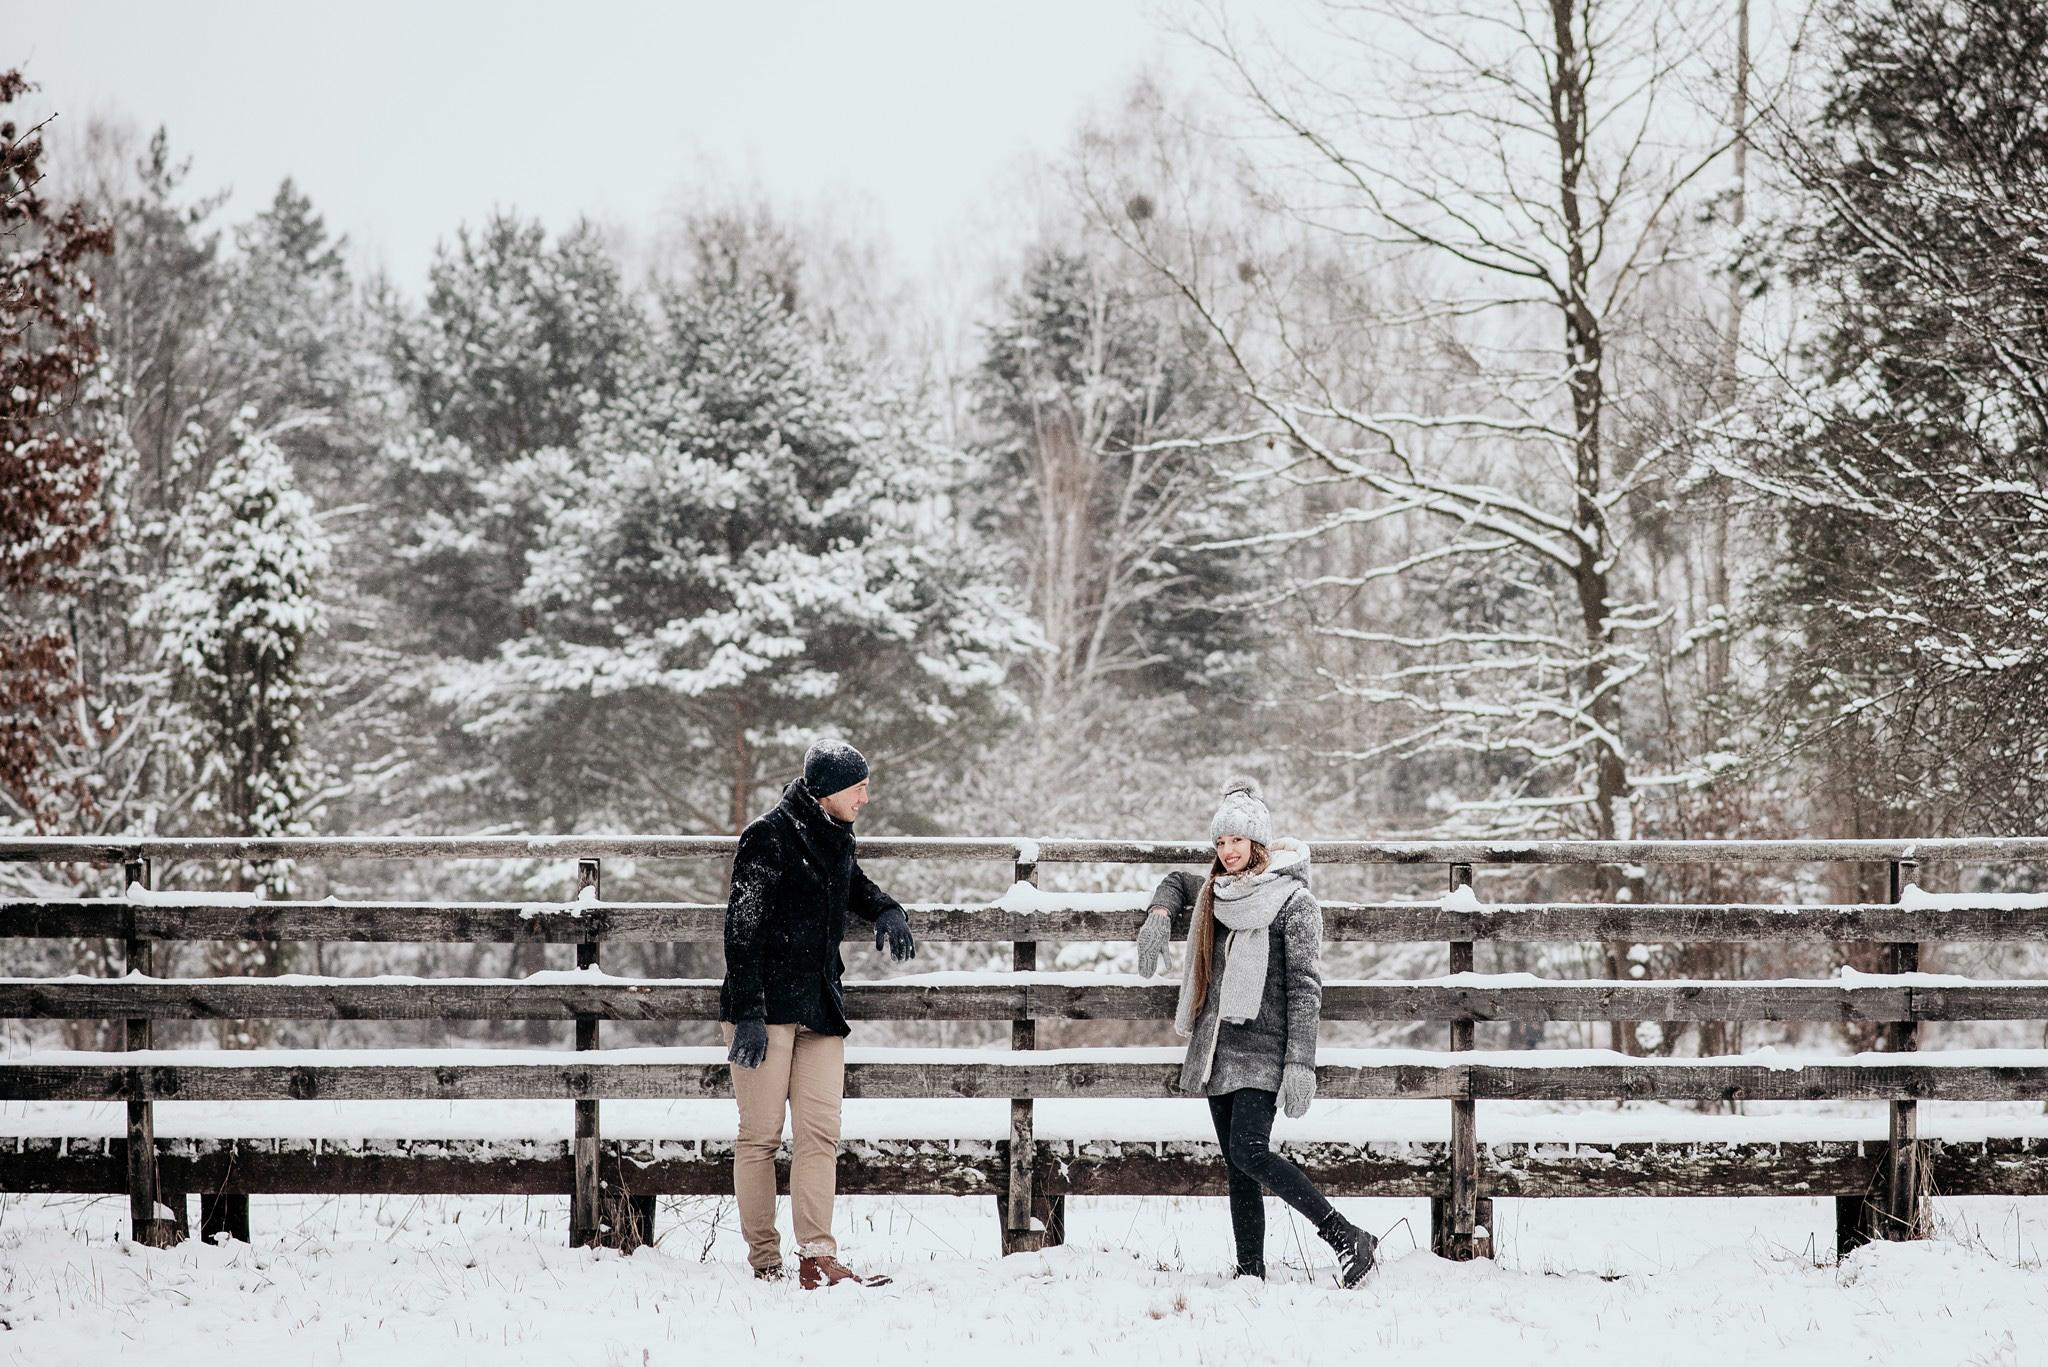 sesja w lesie zima